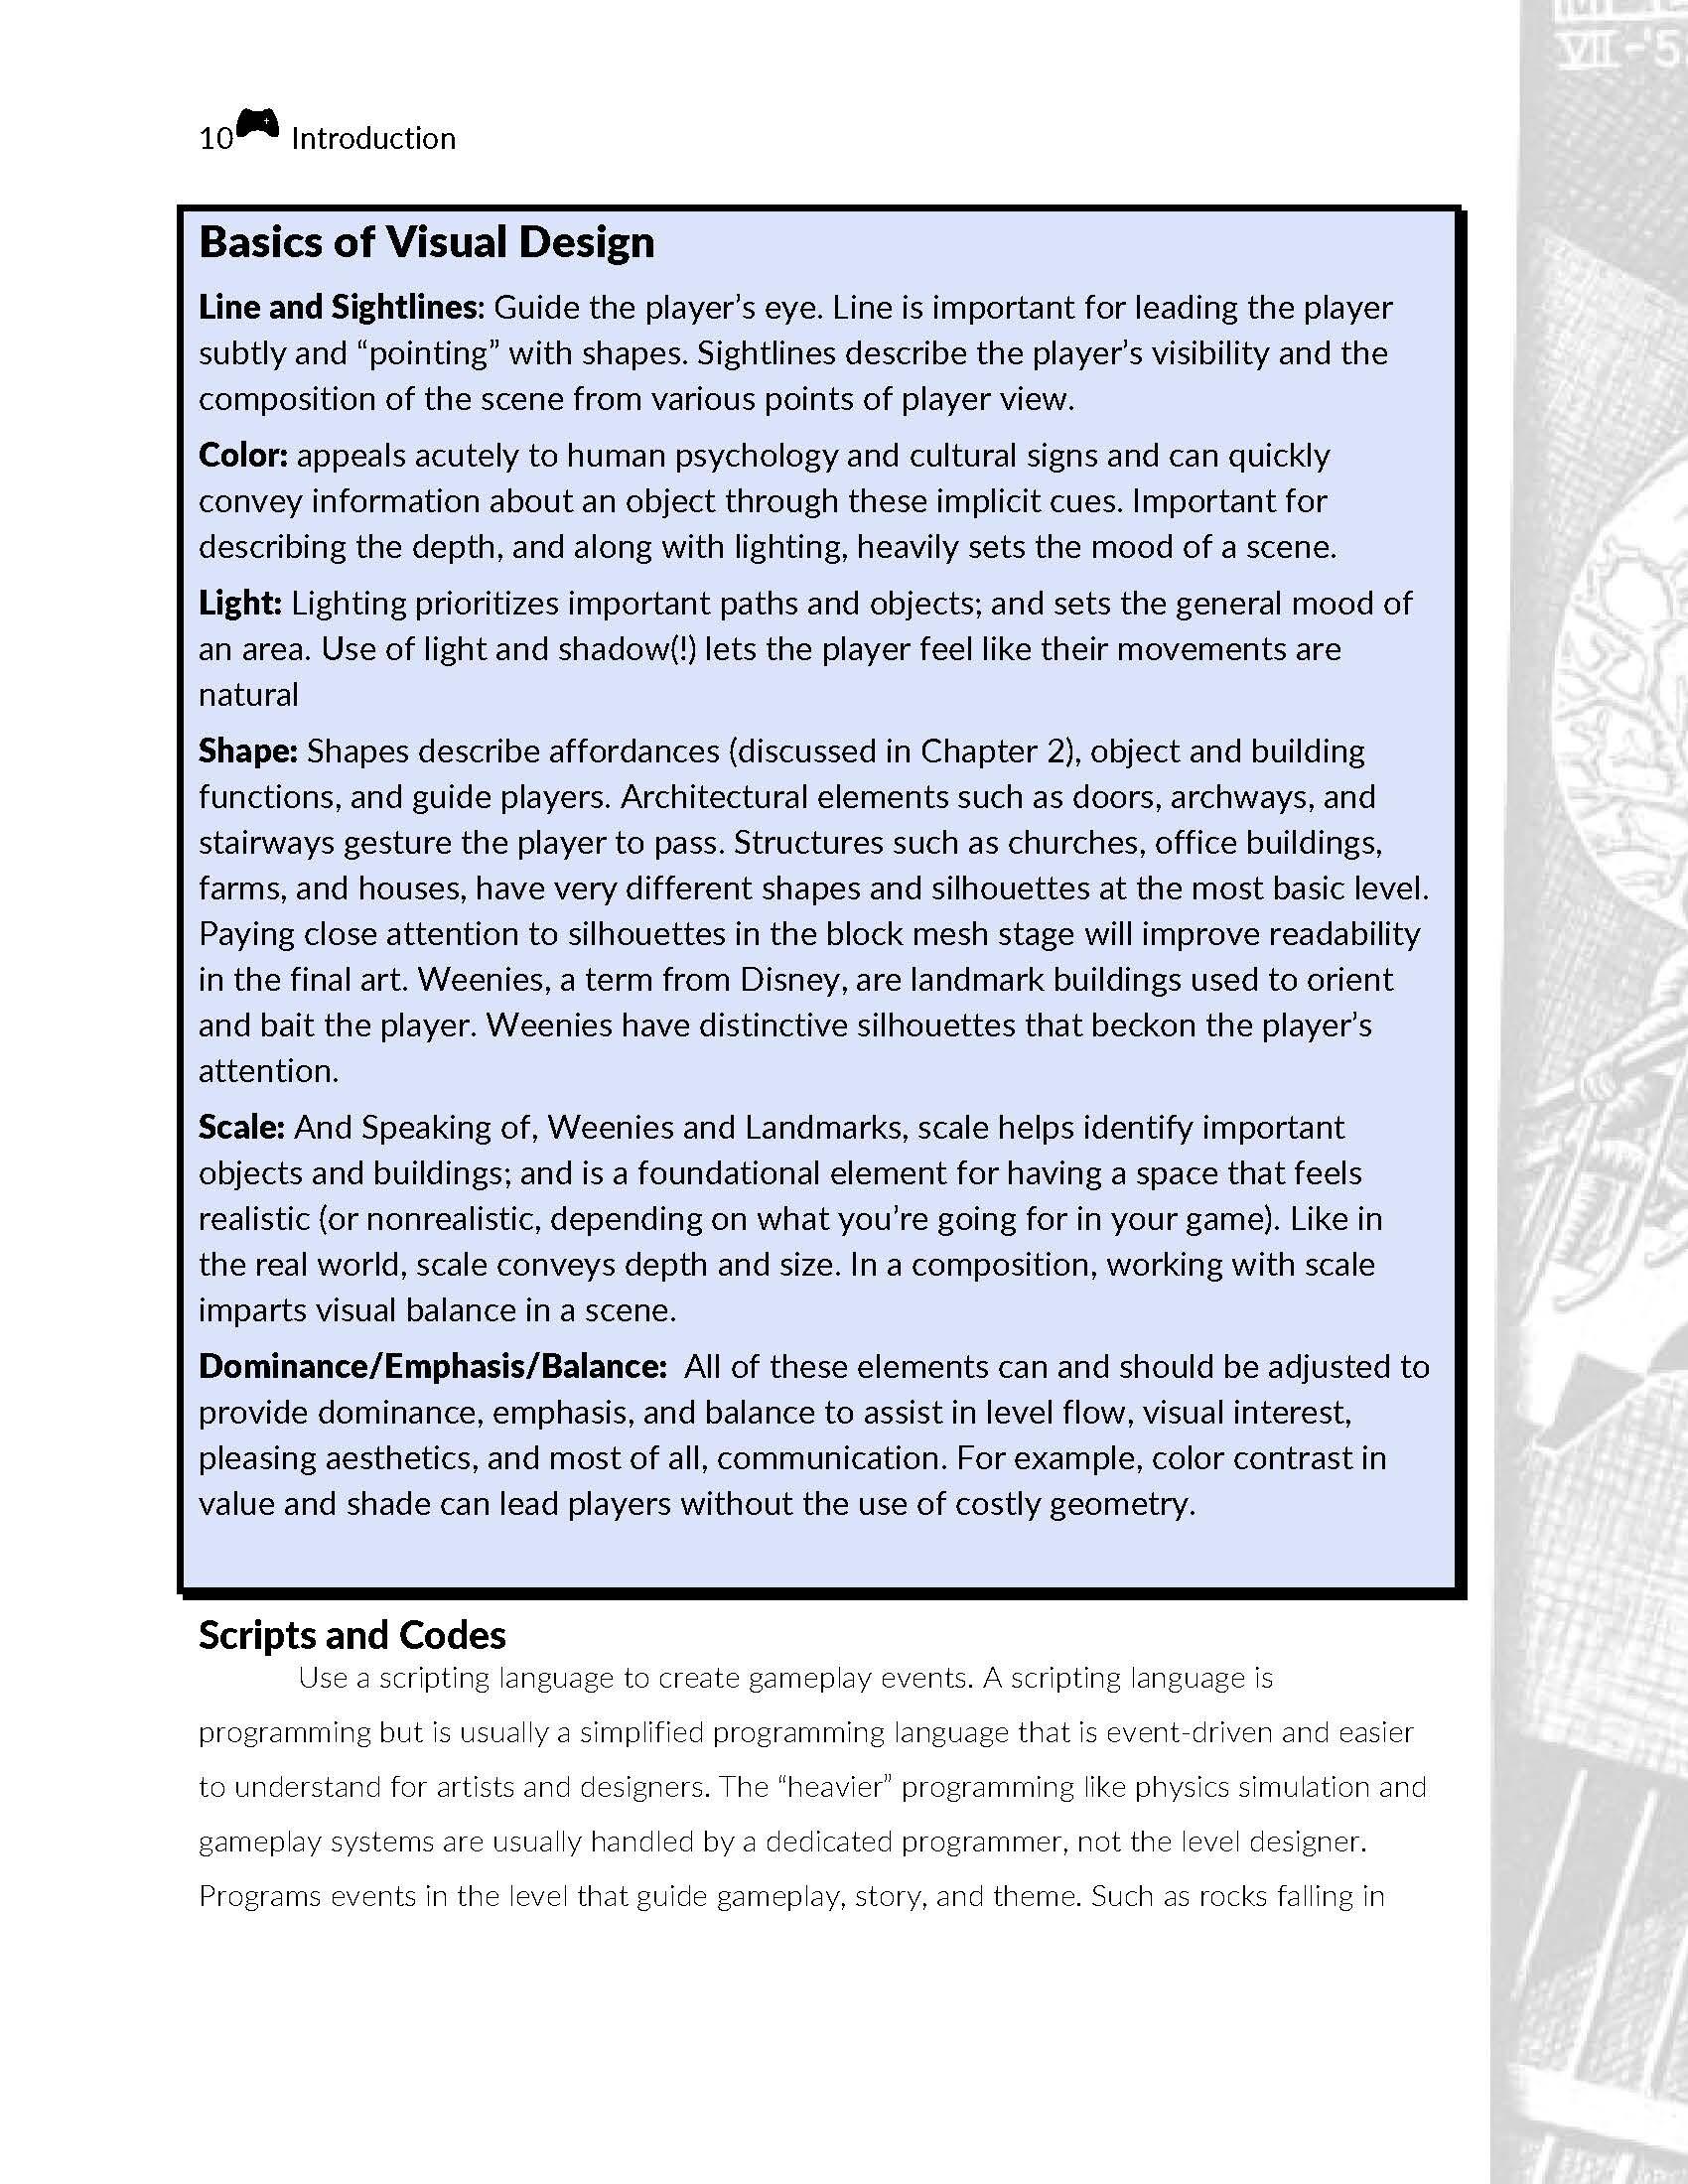 Christina phazero curlee meaningfulleveldesign phazeropdf page 18